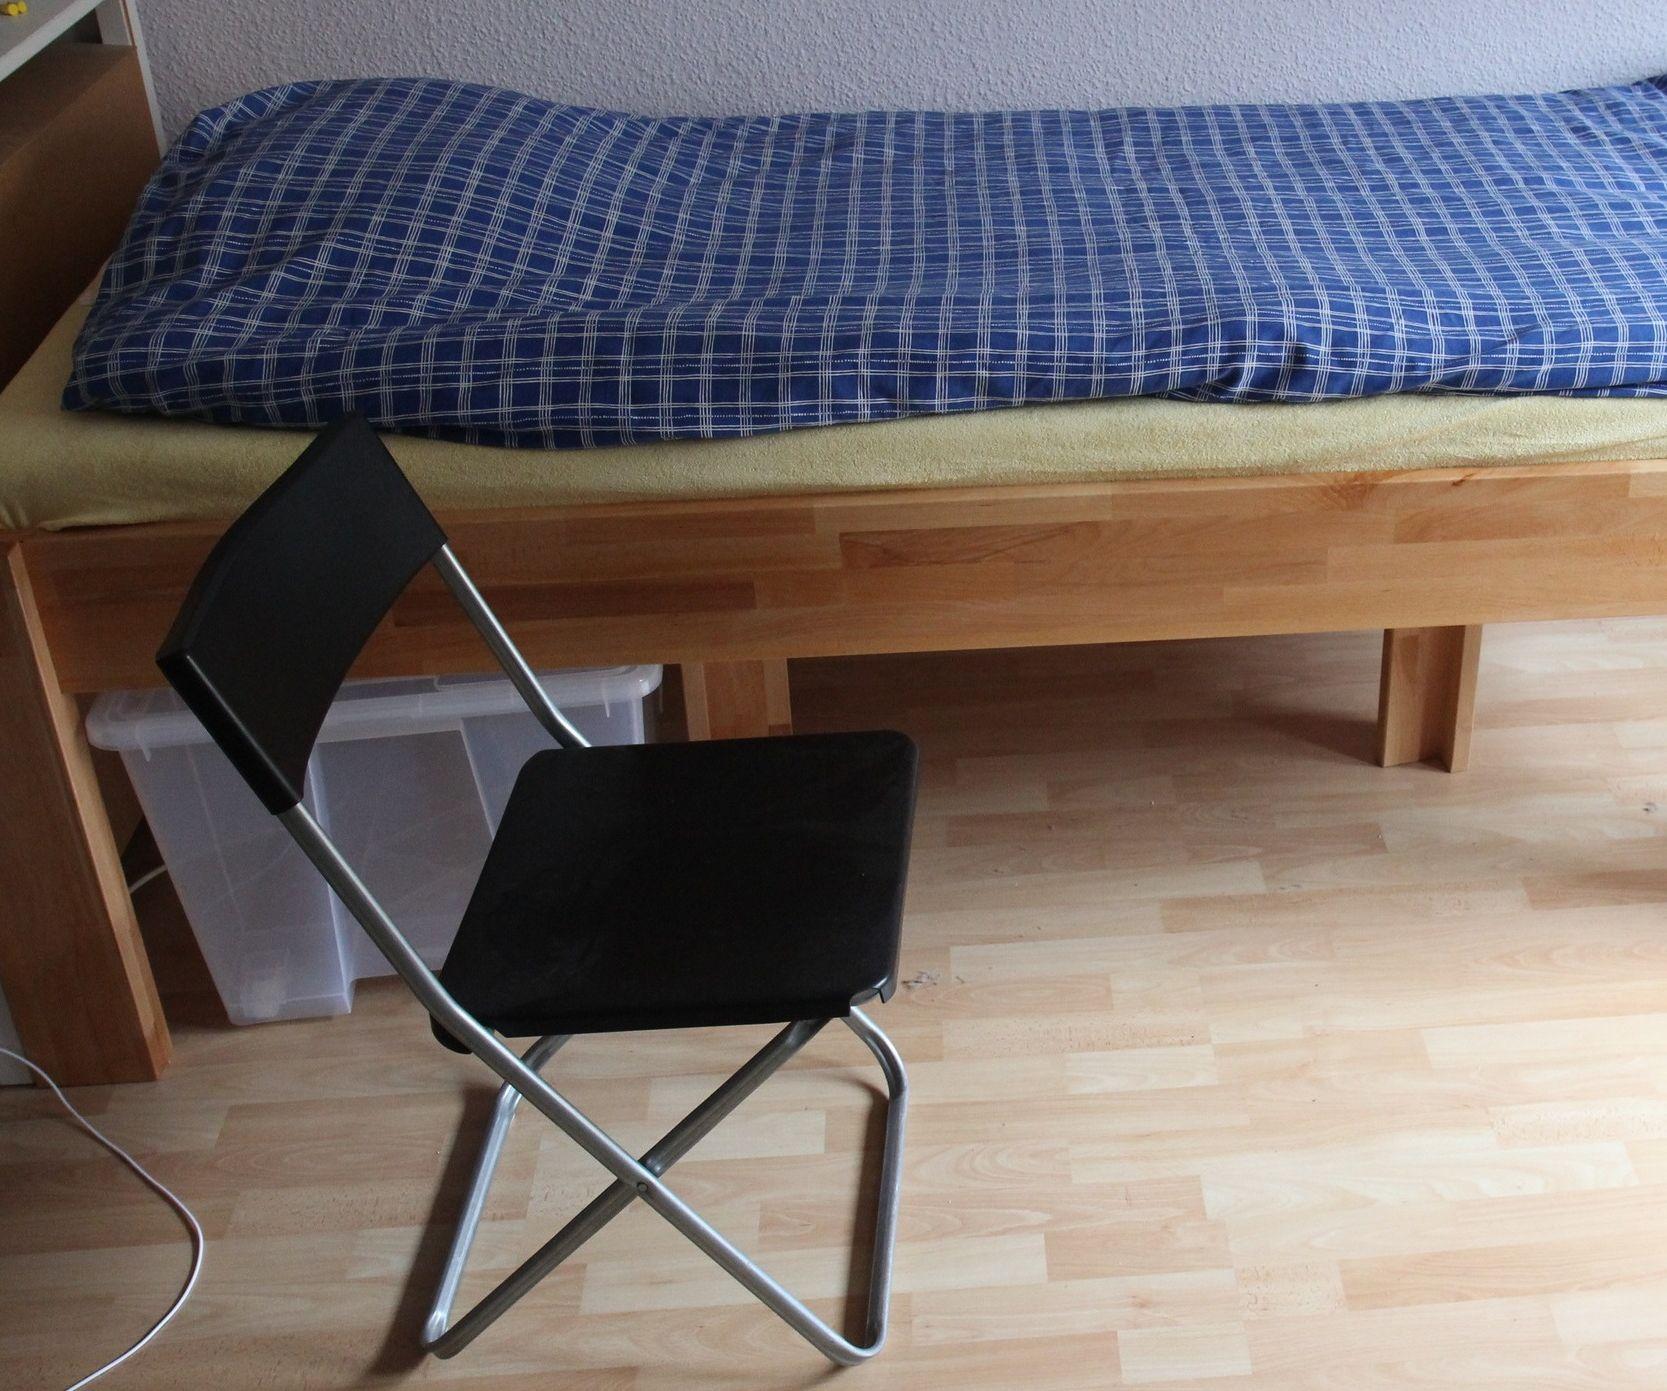 Oversized Modular Bed From Cheap Supplies